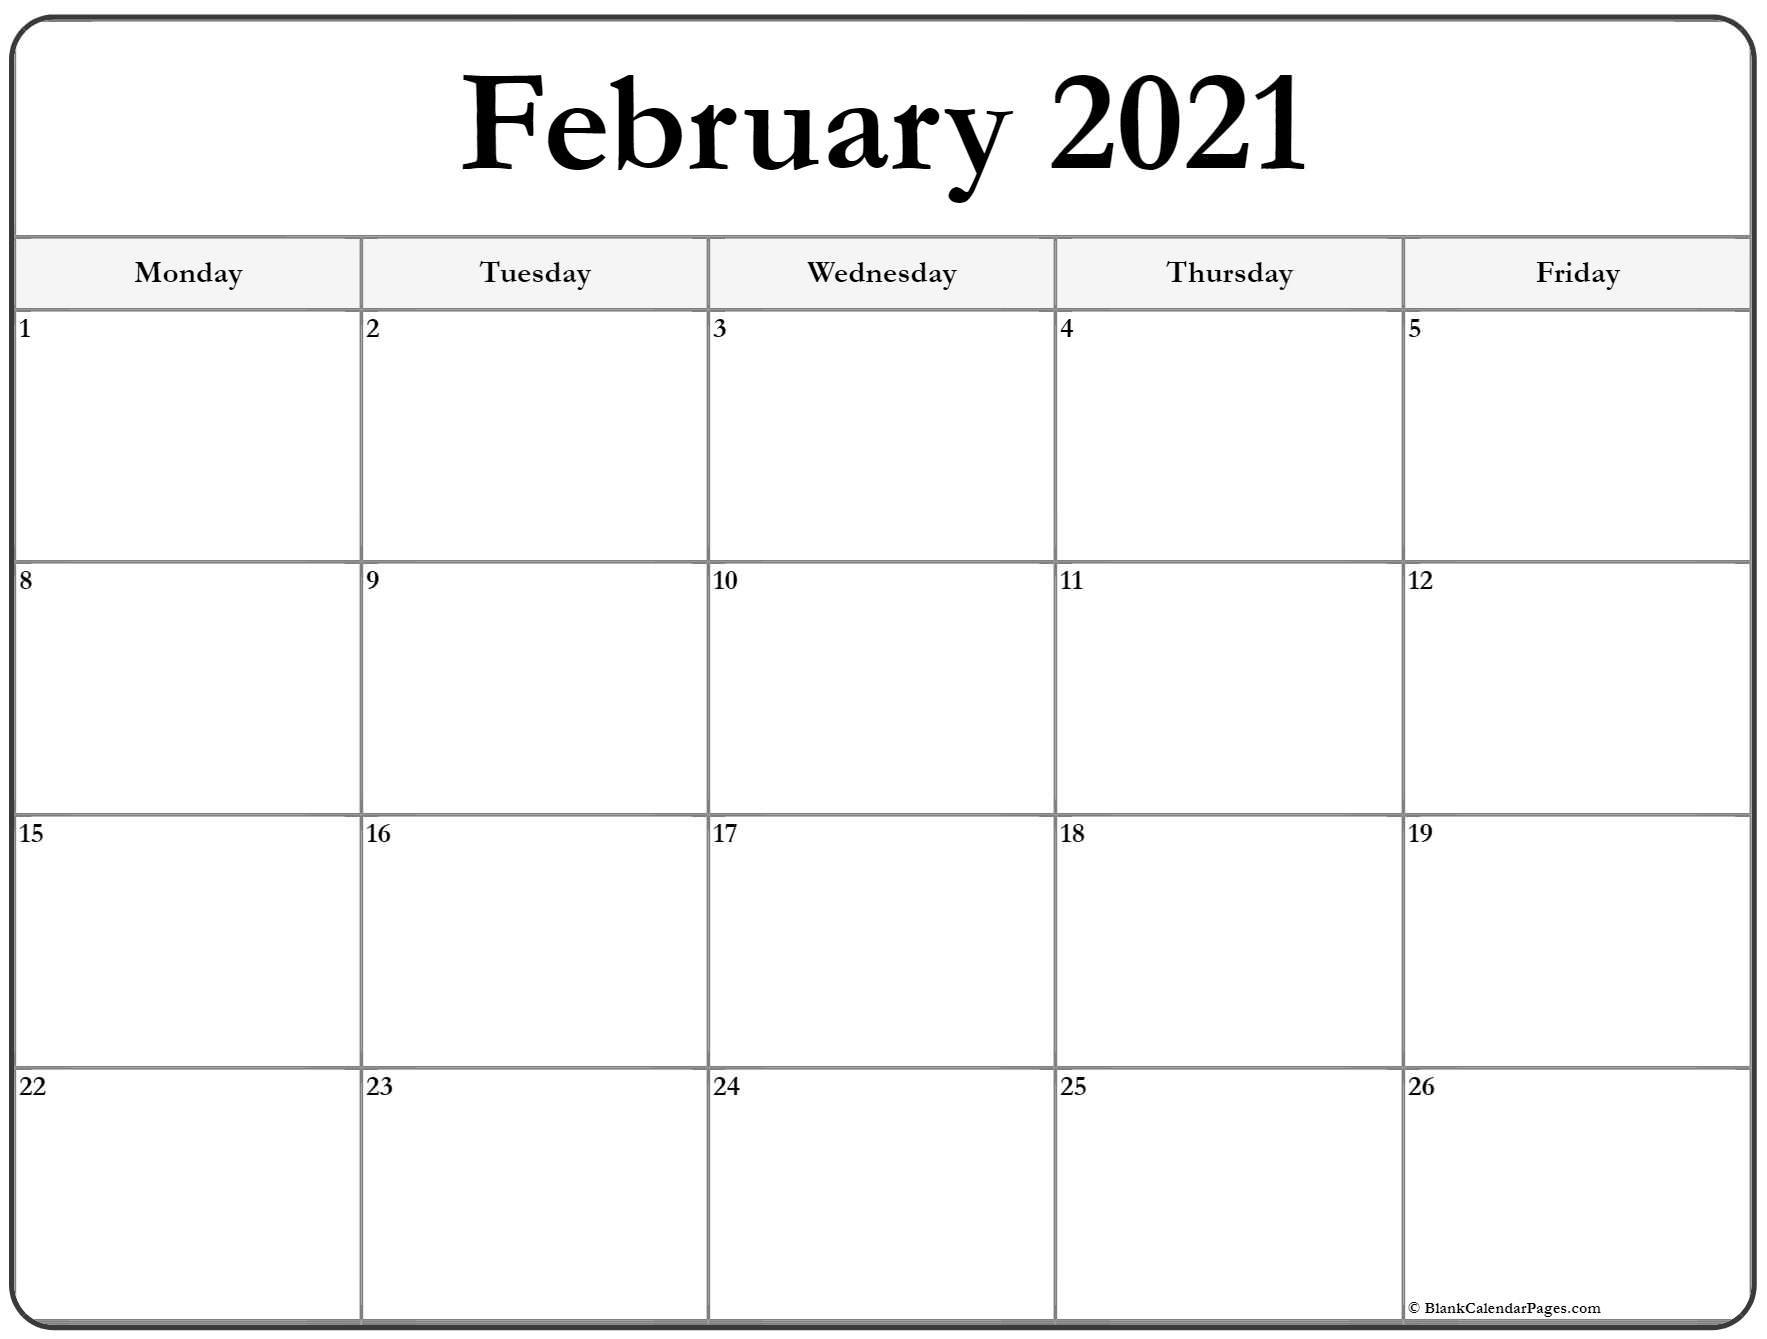 February 2021 Monday Calendar | Monday To Sunday-Sunday To Saturday Calendar 2021 Printable